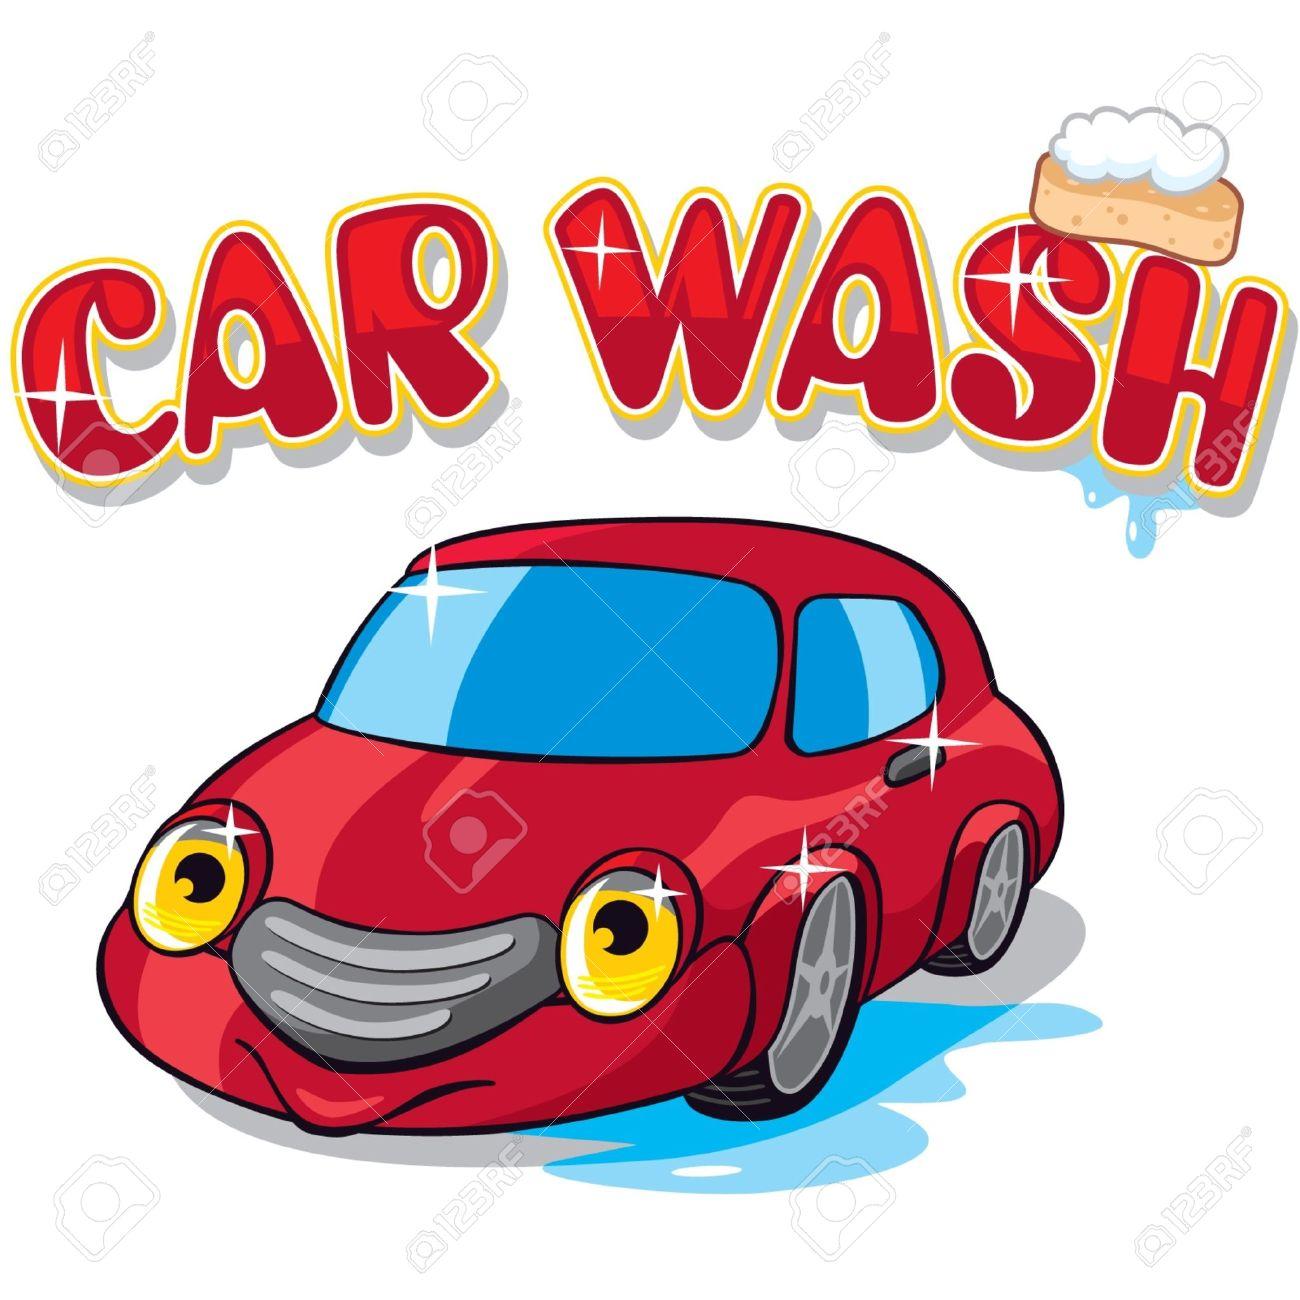 Cartoon Car with Car Wash Sign.